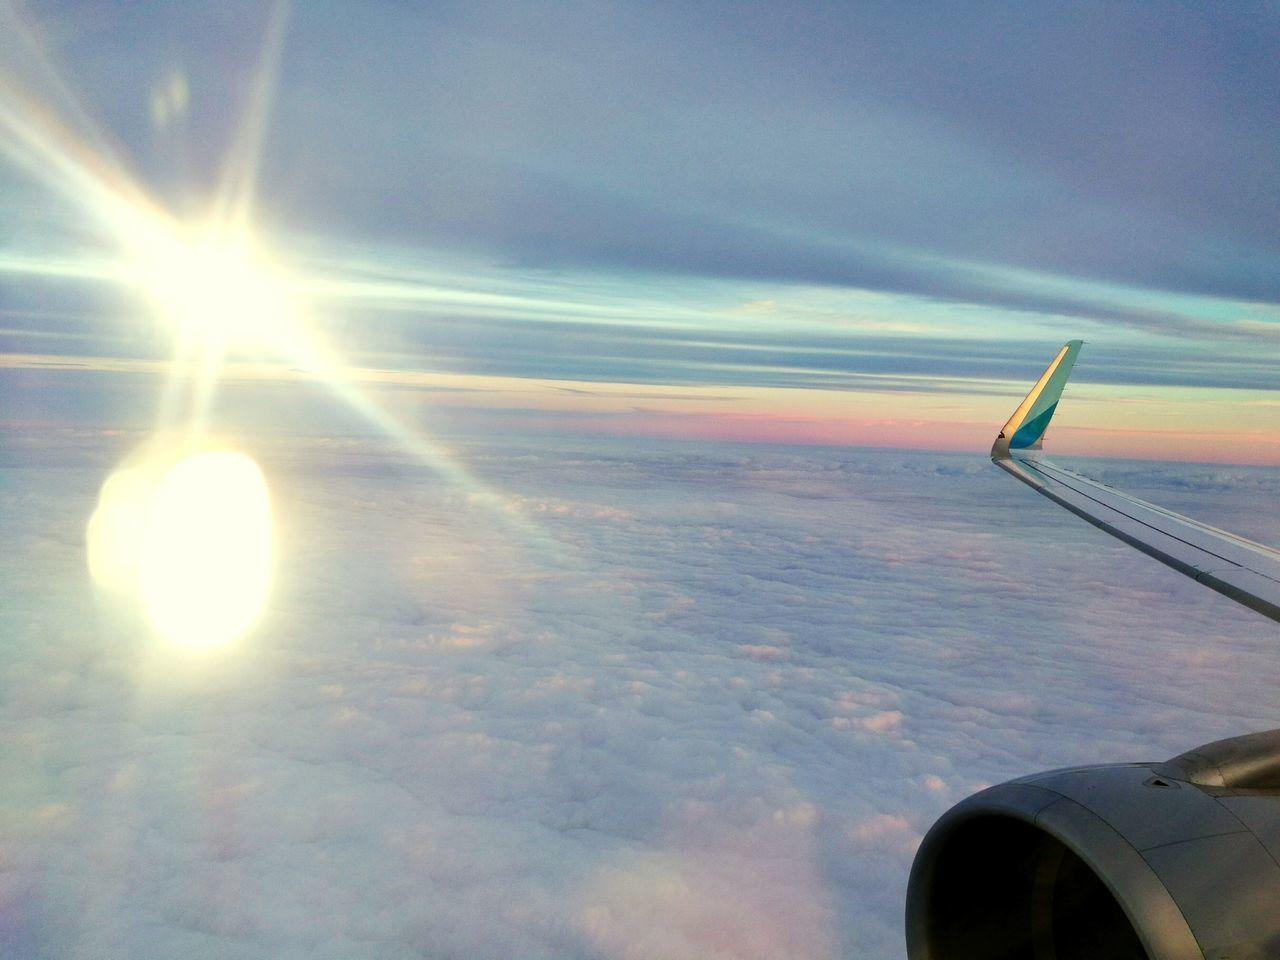 AirPlane ✈ Airplane Sky Heaven♥ Heavenly Clouds Heaven HeavenlyCloud - Sky Flying небо облака небо и облака небо⛅️ небо небеса